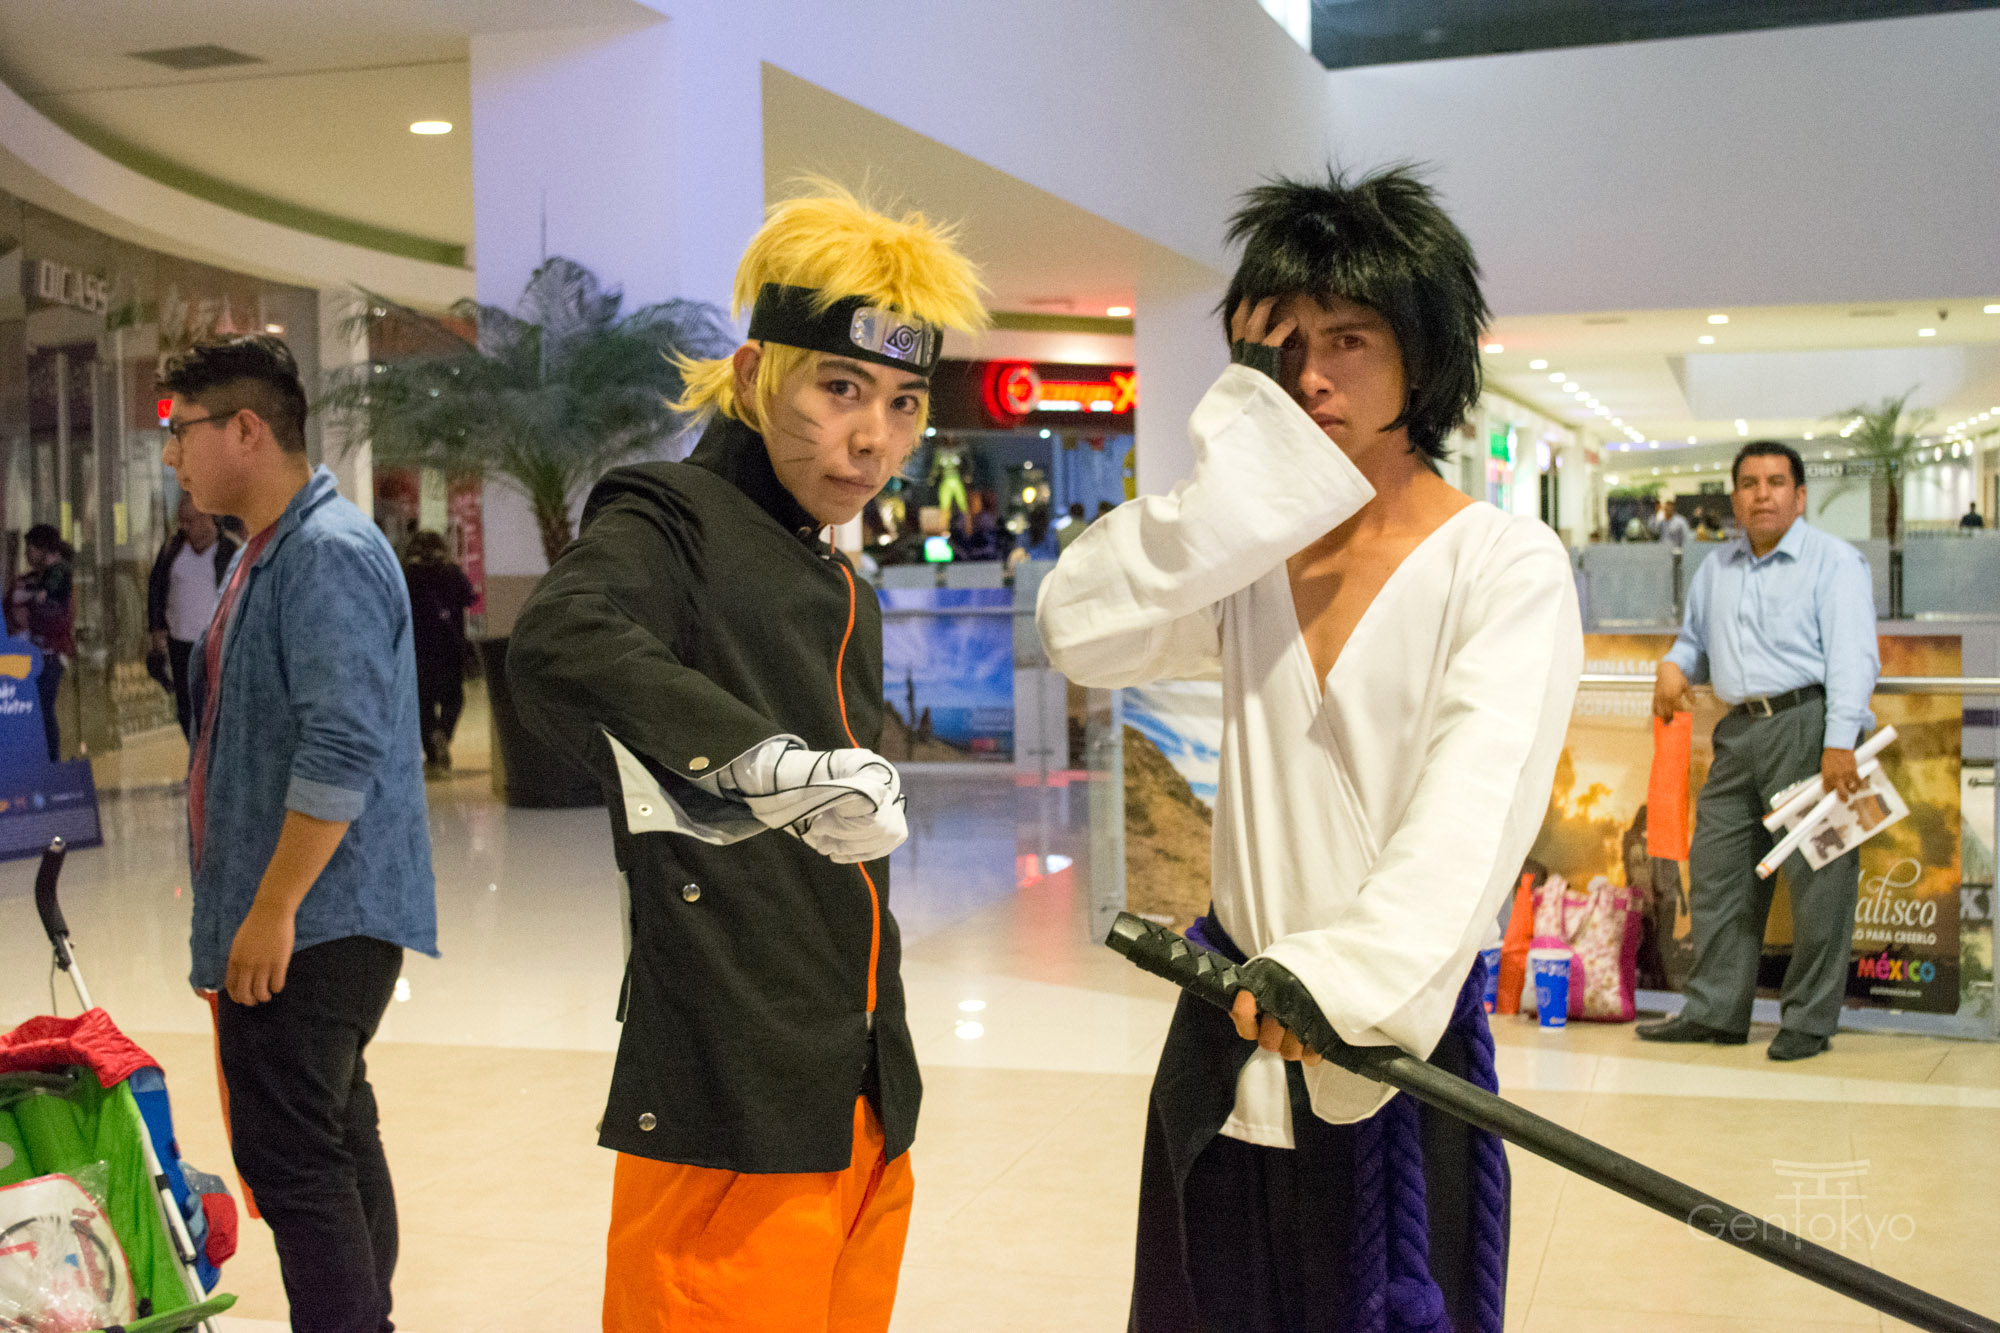 The-Last-Naruto-the-Movie-Mexico-26